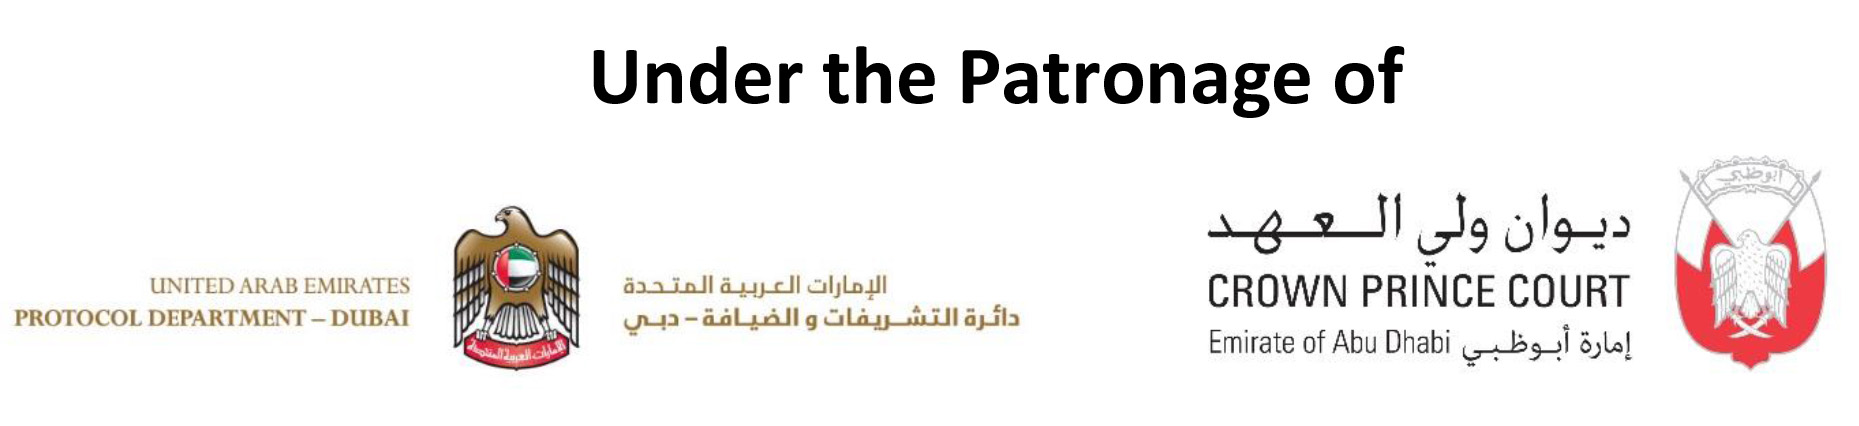 2014 PDD-CPC Patronage